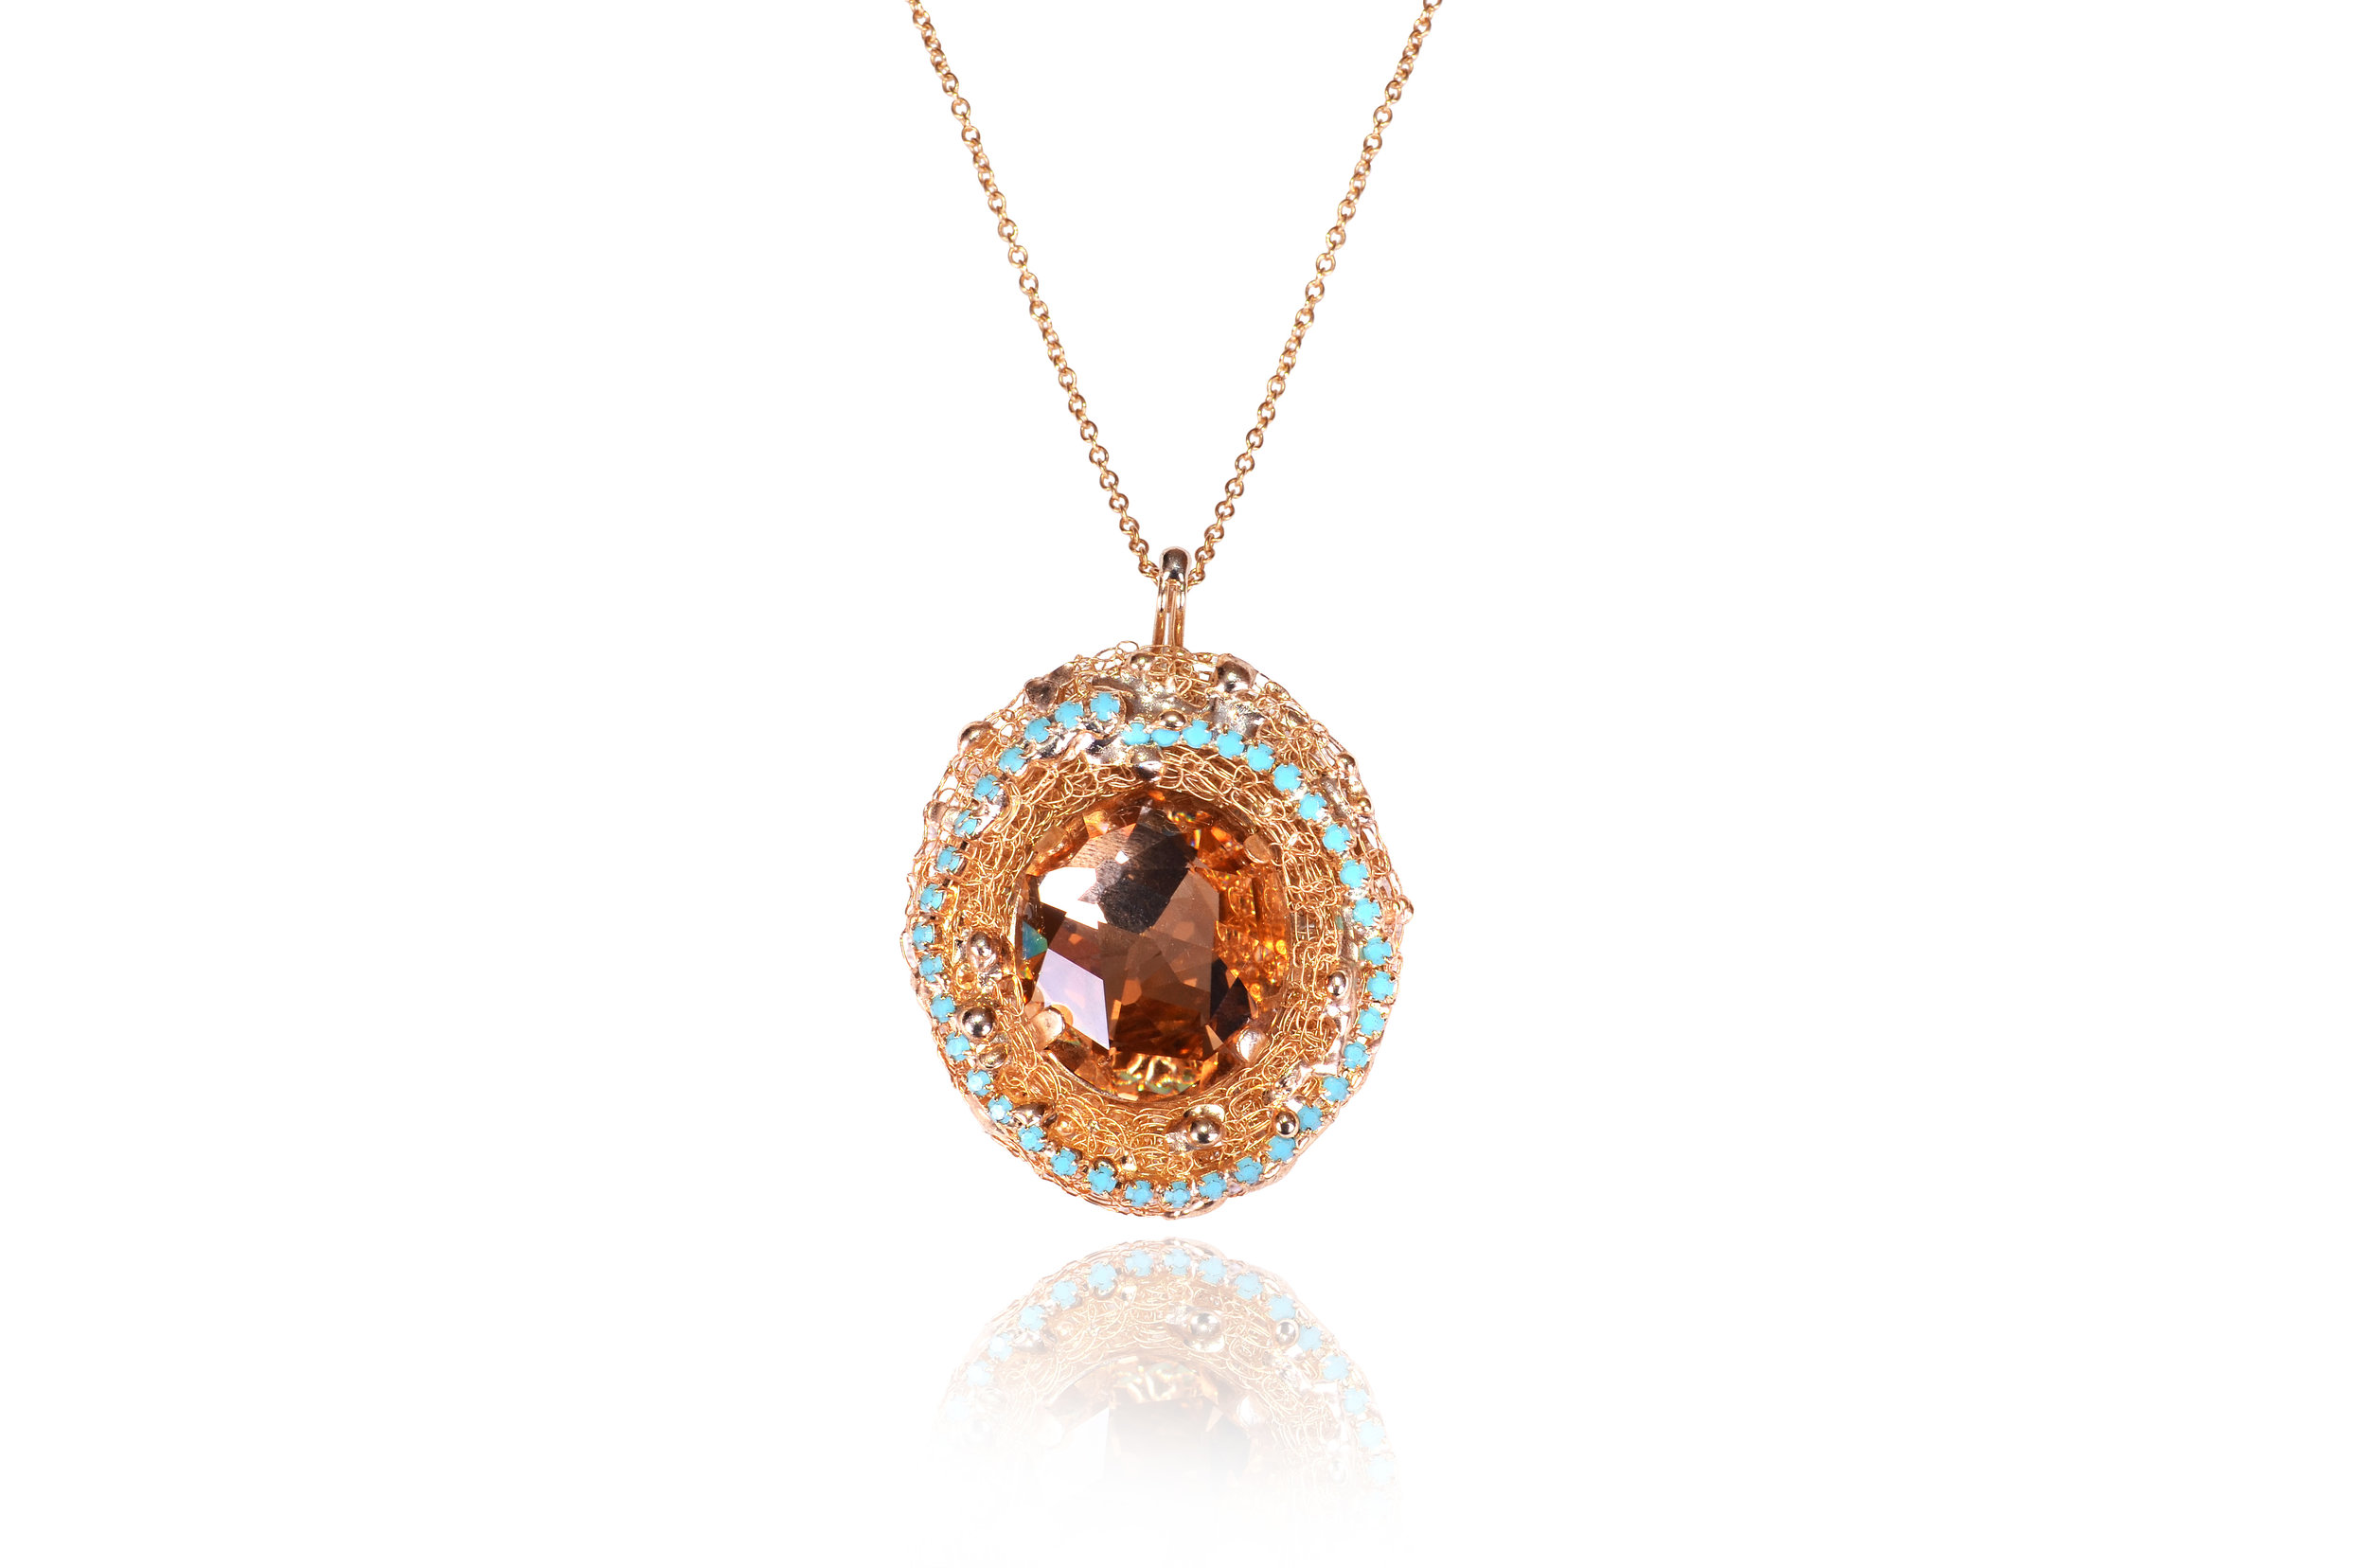 EVATCWQQP_2 - Evatini - Brown Topaz and Swarovski Strass Pendant - Italian Handmade Jewellery.jpg